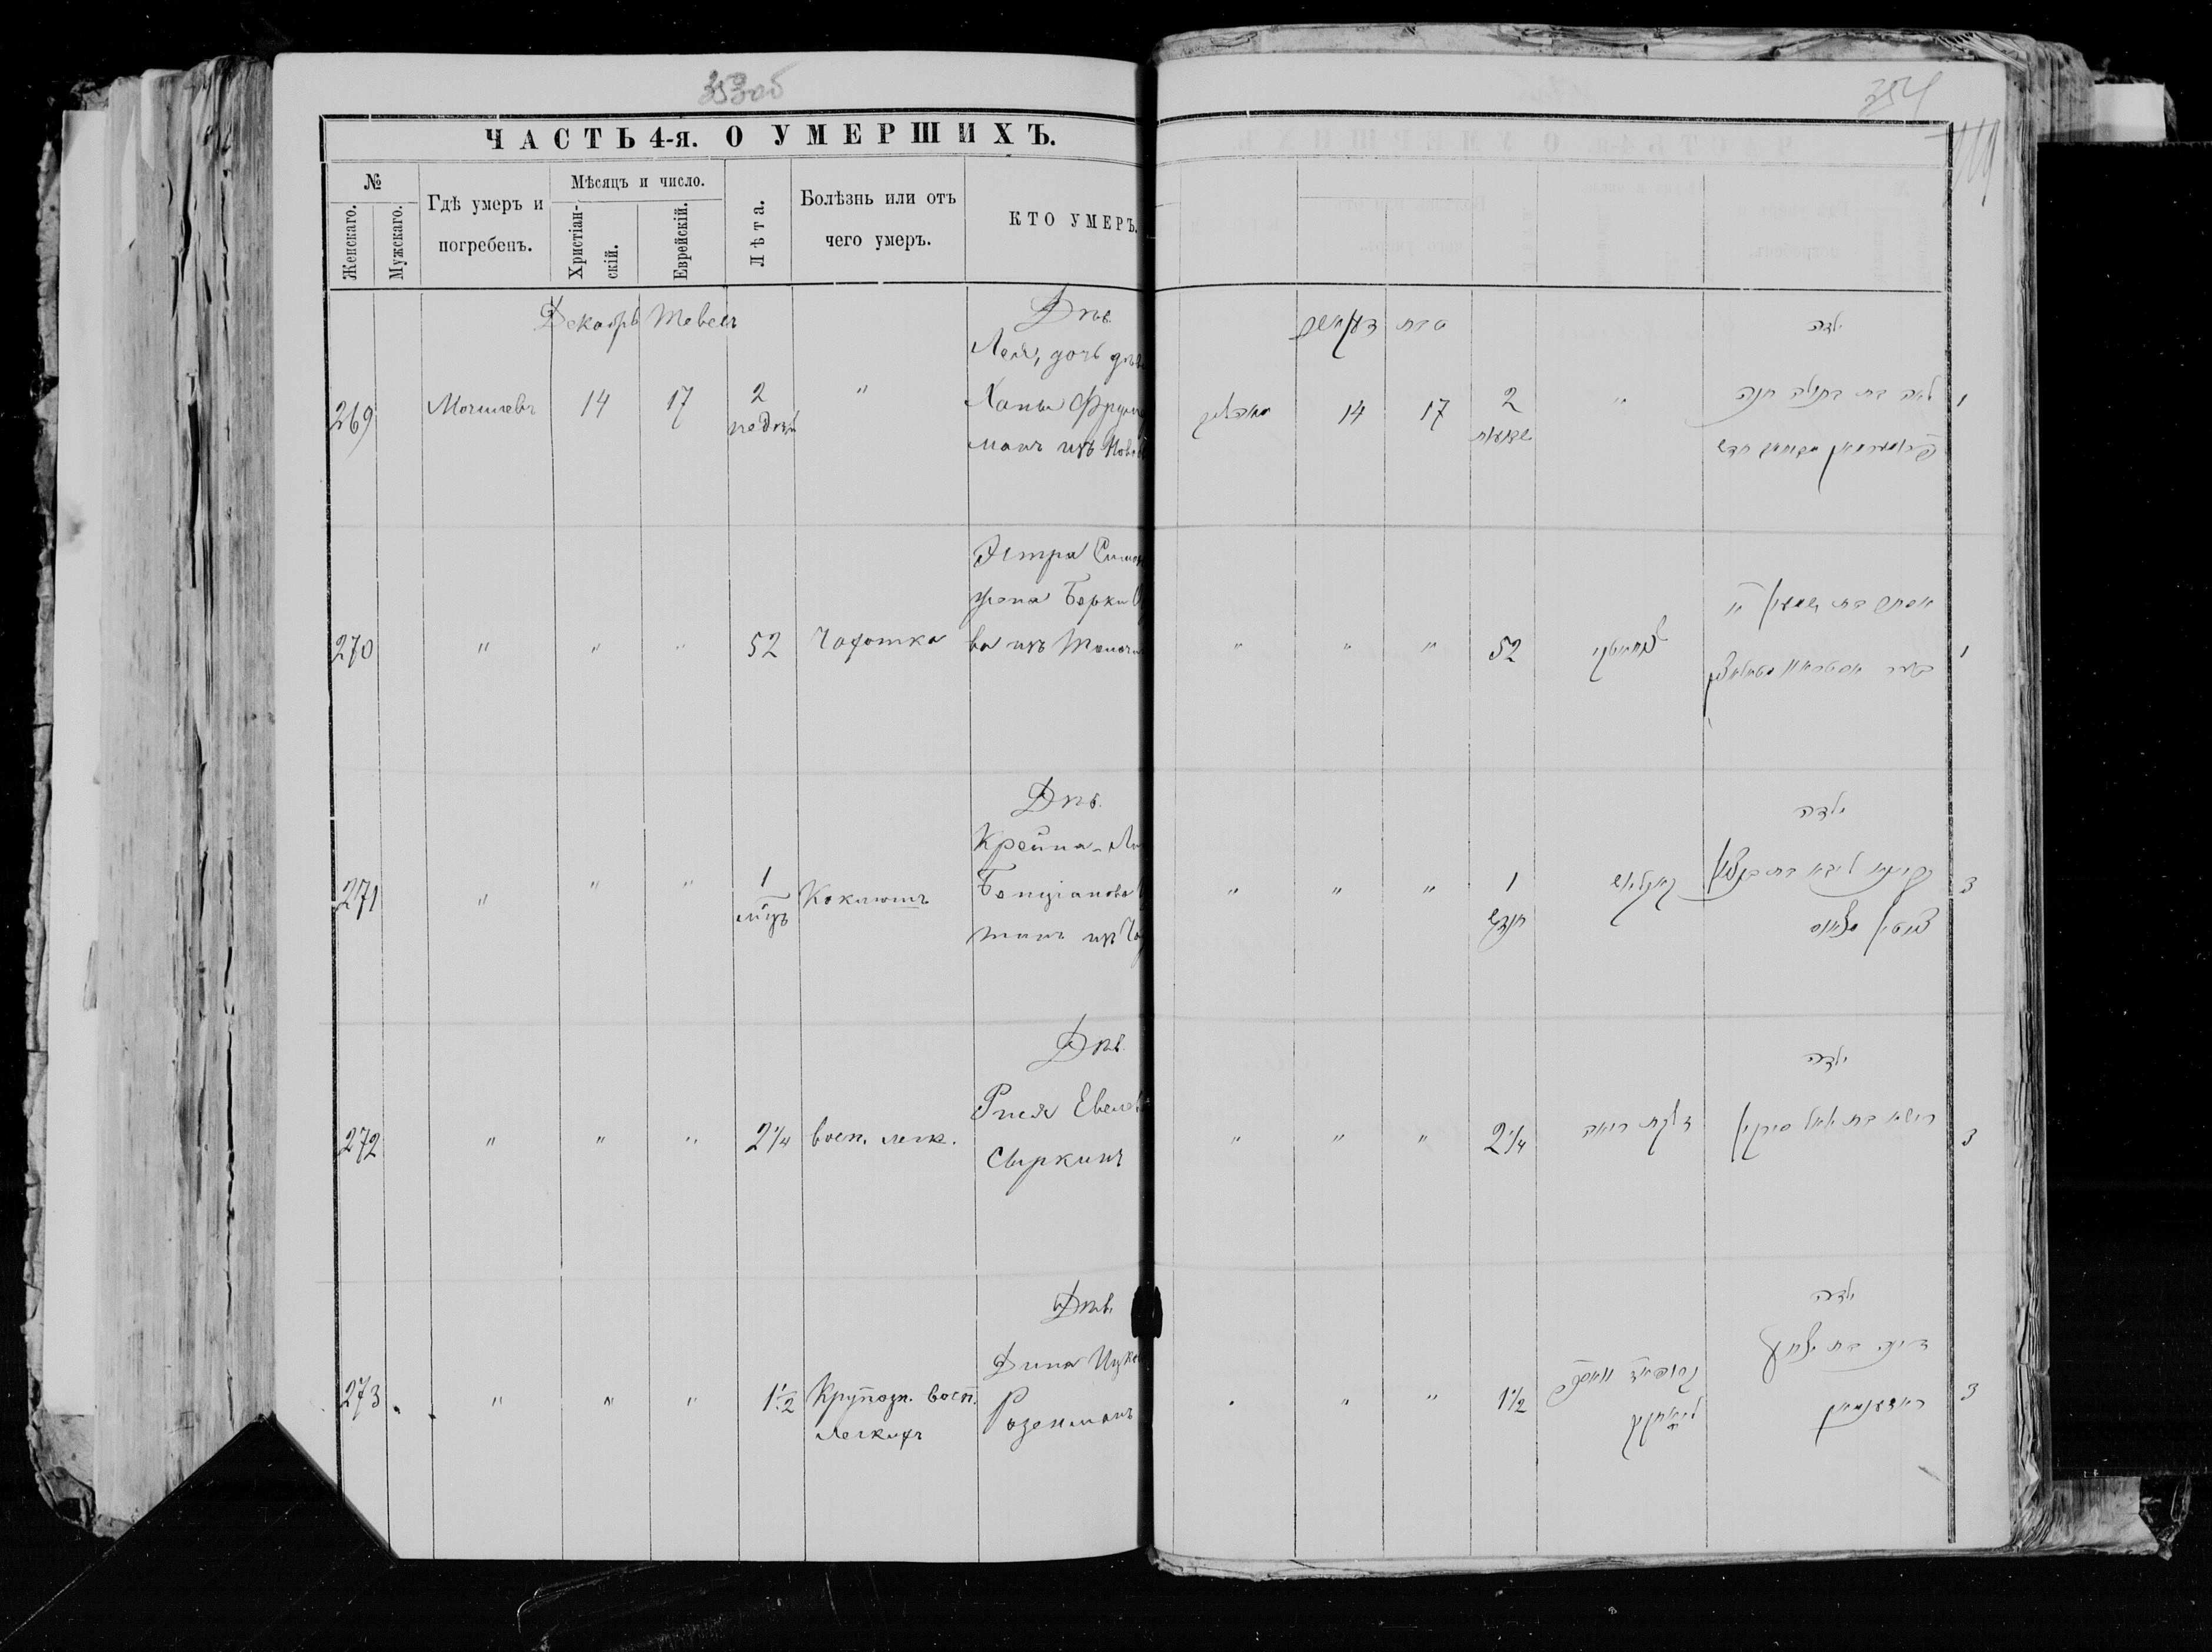 Эстра Симоновна Острова ум. 14 декабря 1893, запись 270, пленка 00453097, снимсок 877